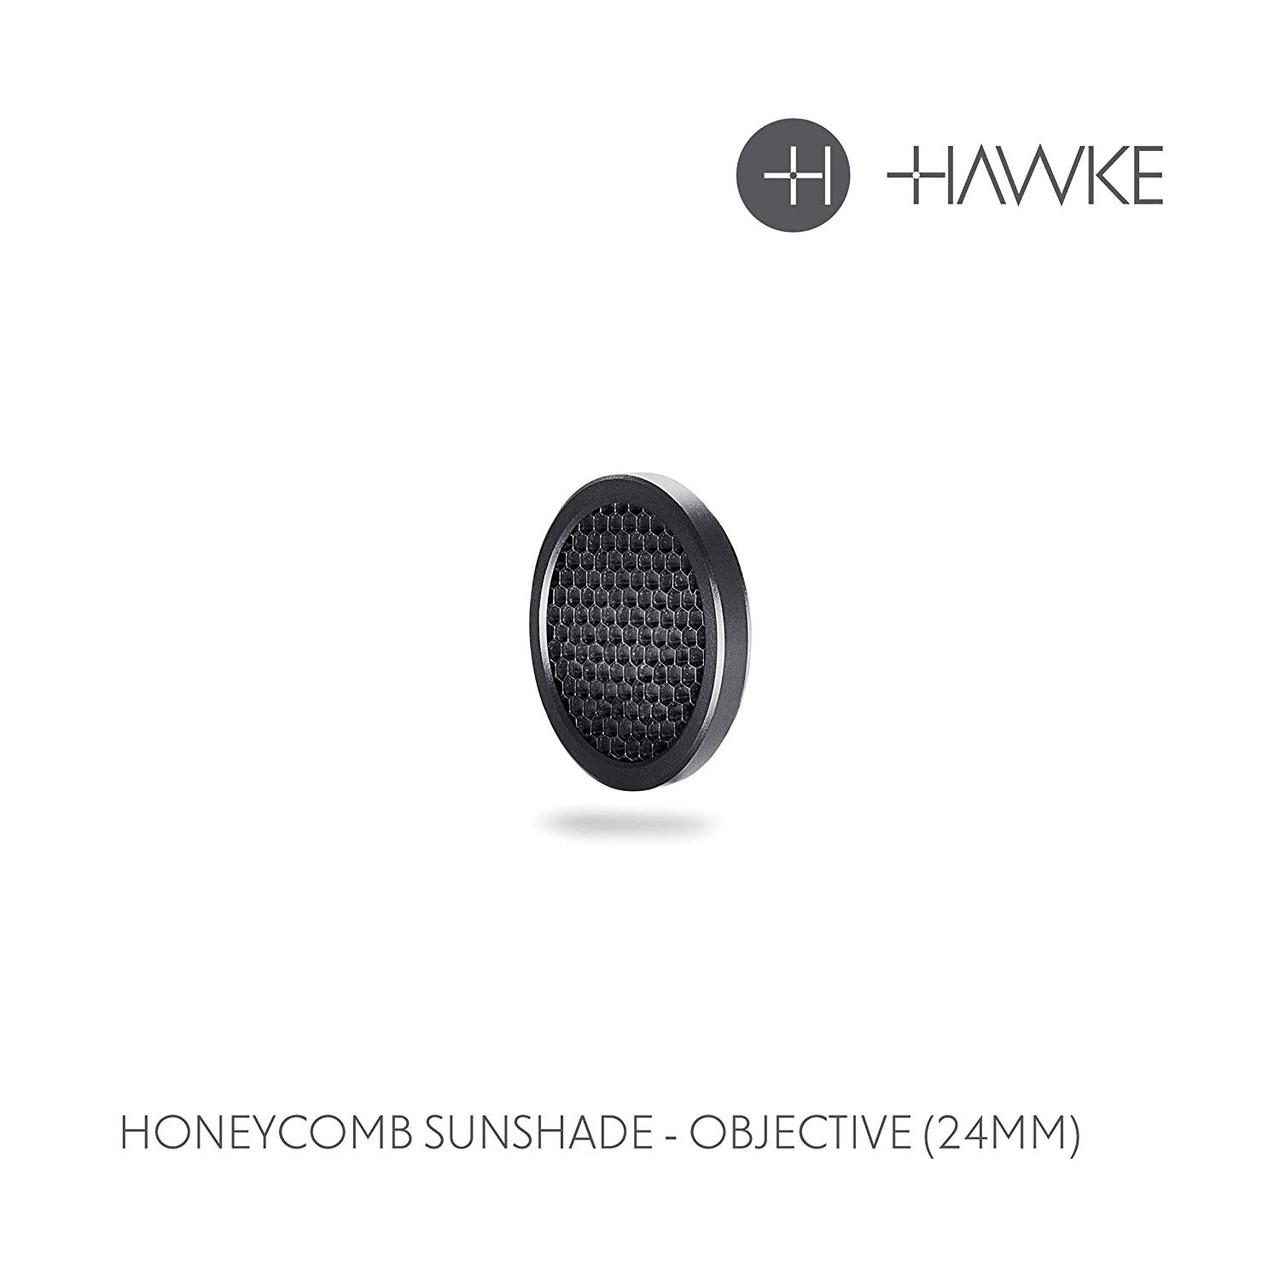 Hawke Honeycomb Rifle Scope Sunshade, 24mm Obj - 62100